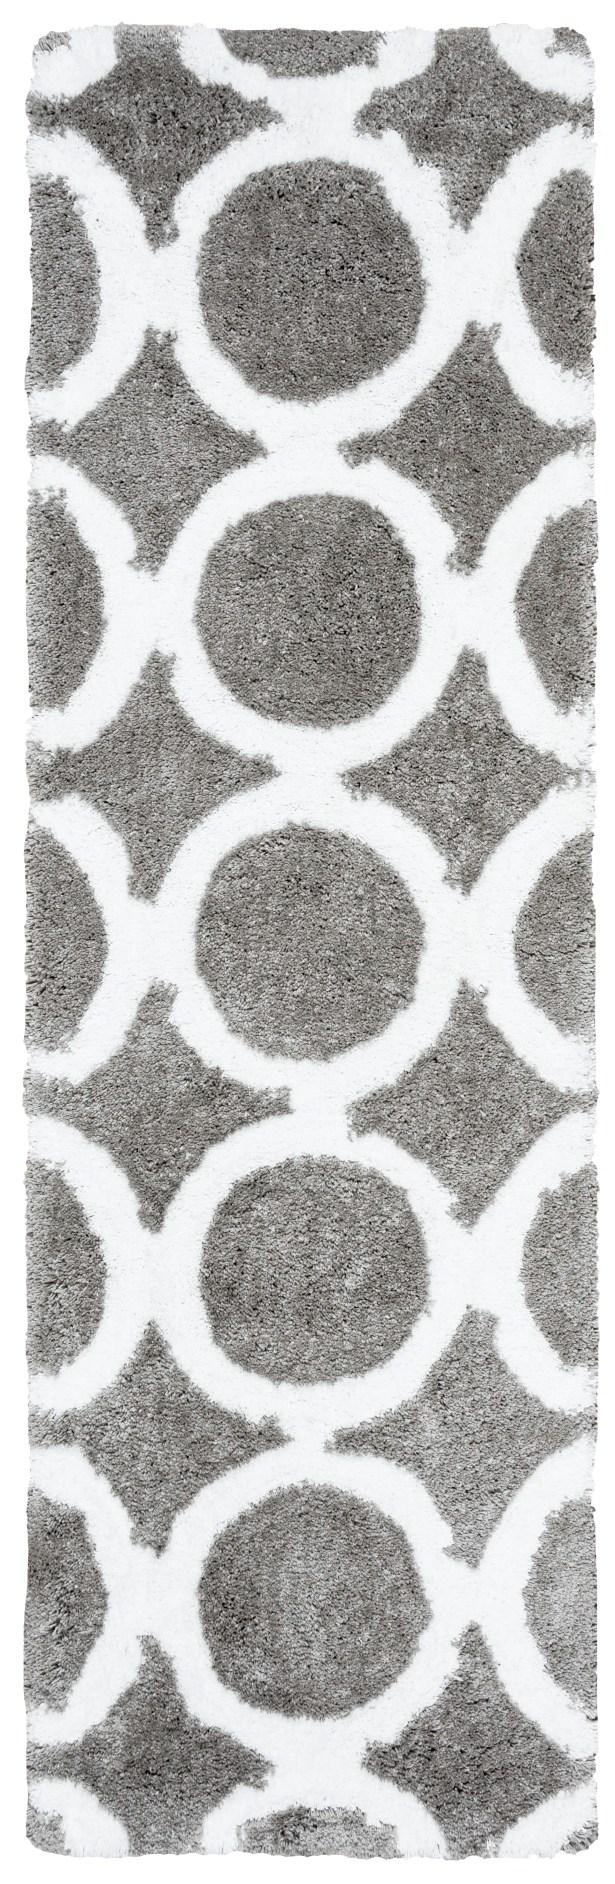 Mckinney Hand-Tufted Gray Area Rug Rug Size: Runner 2'6